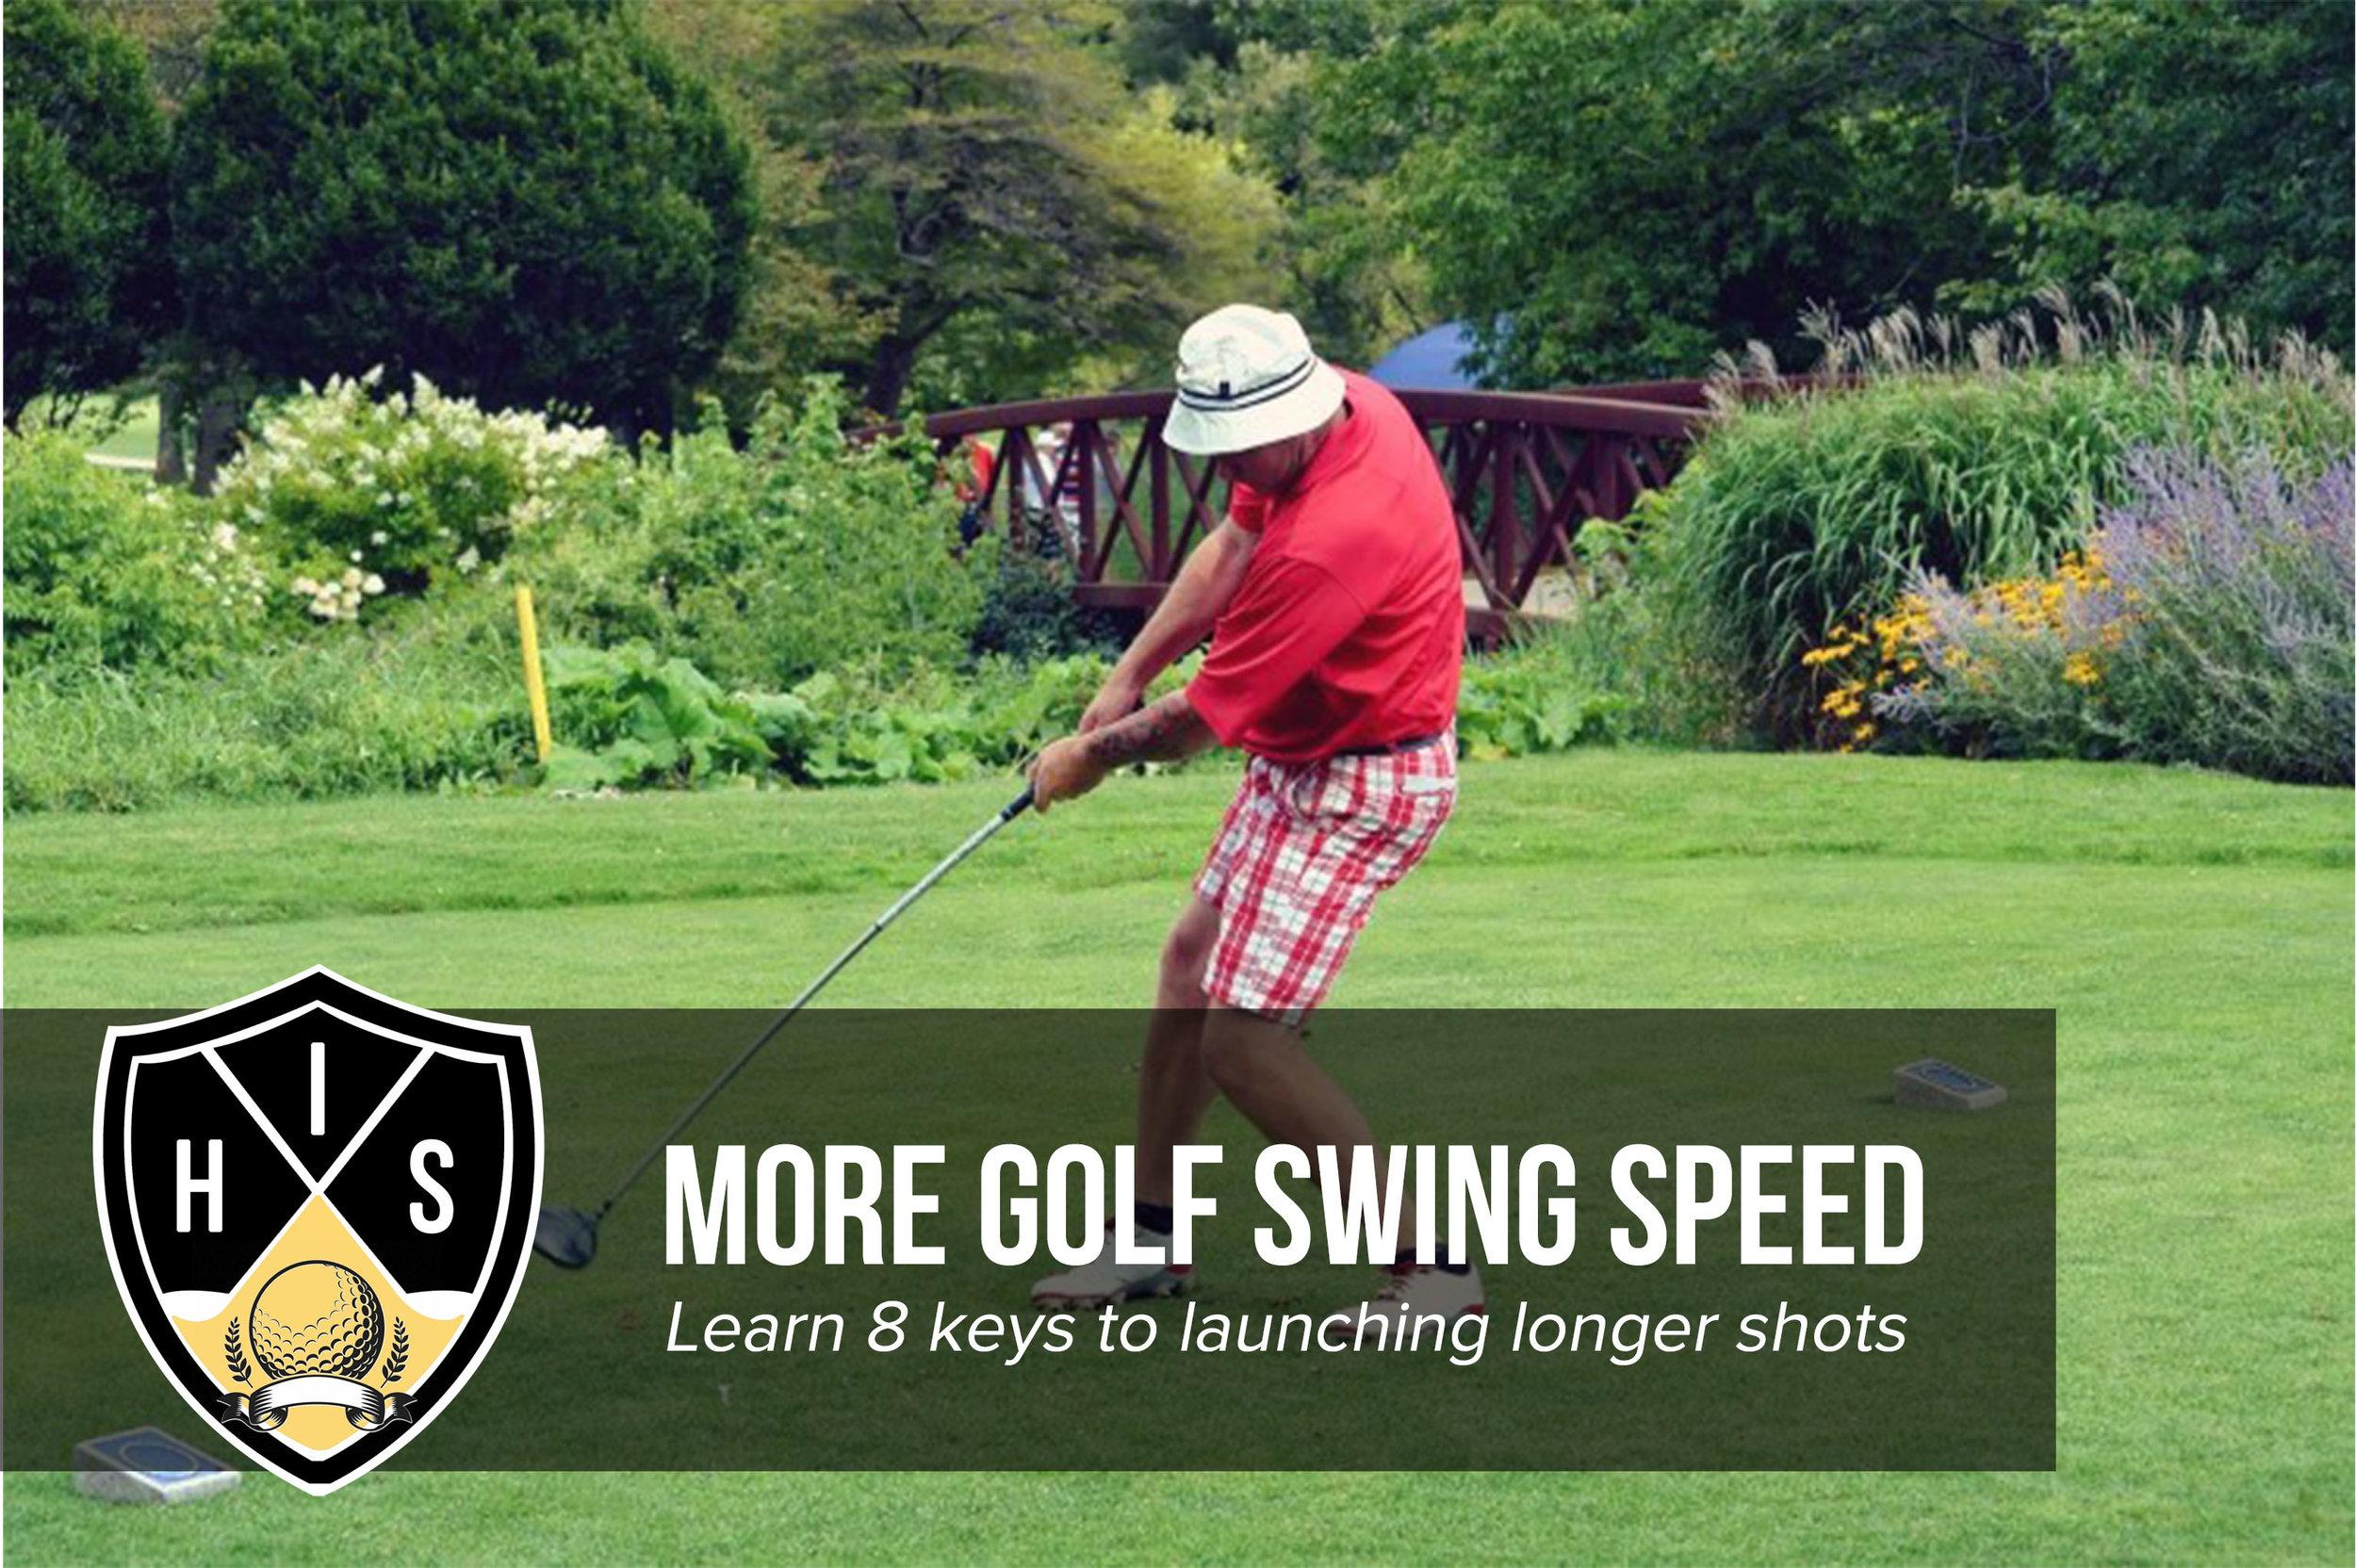 Increase Golf Swing Speed